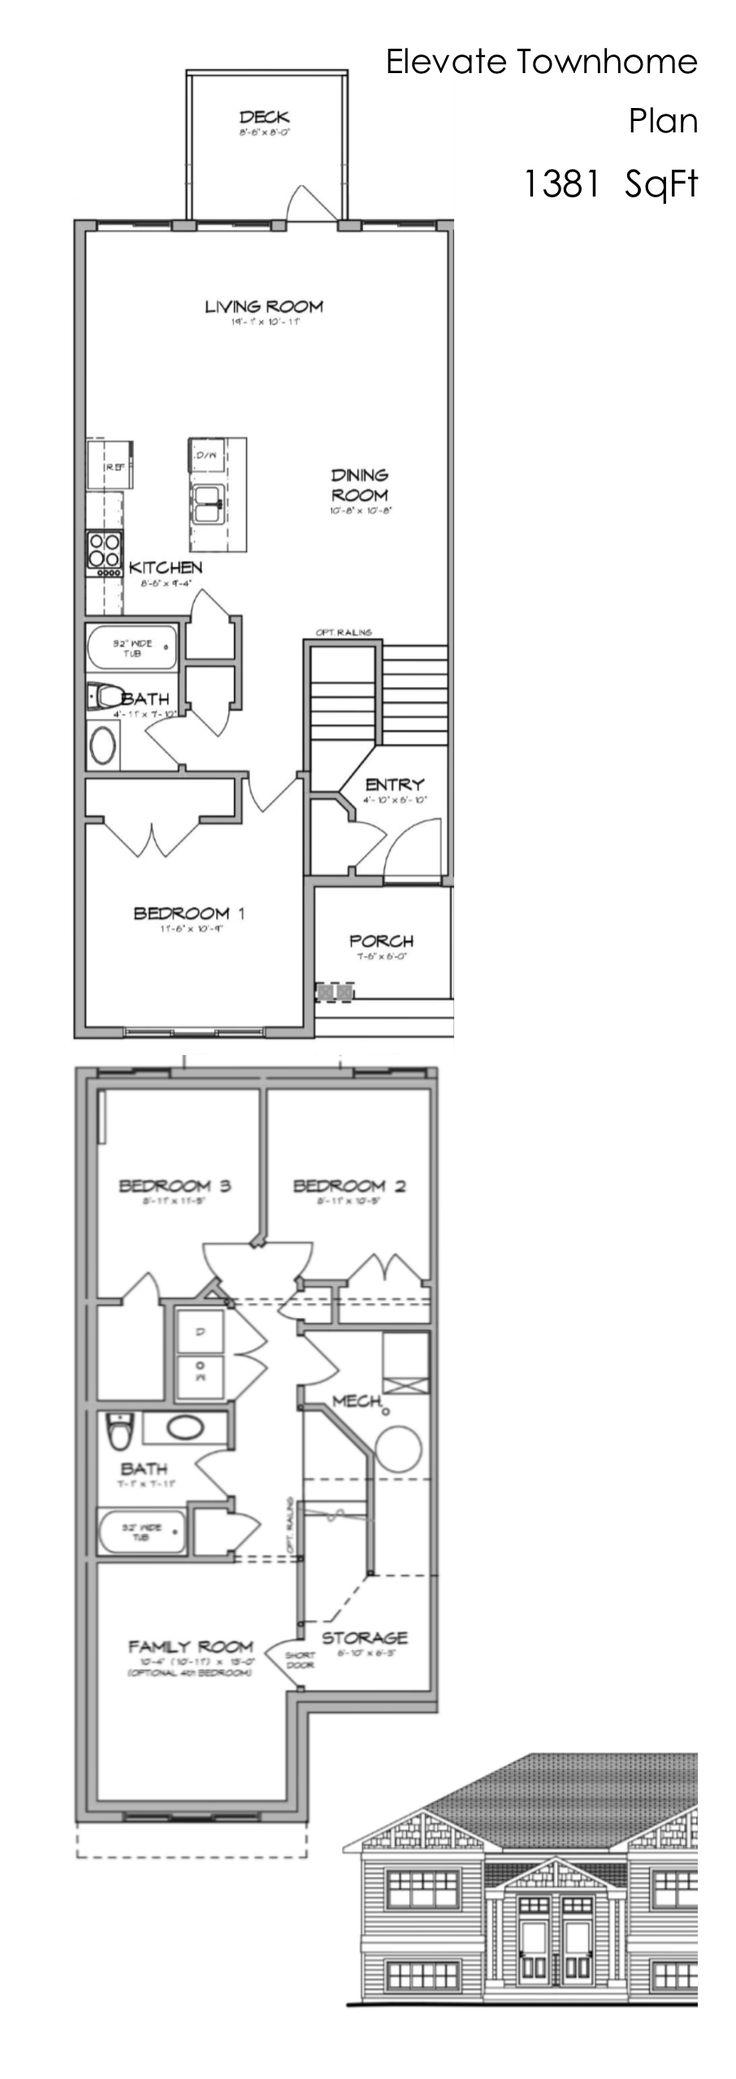 35 best Home Plans images on Pinterest   Home design plans, Home ...